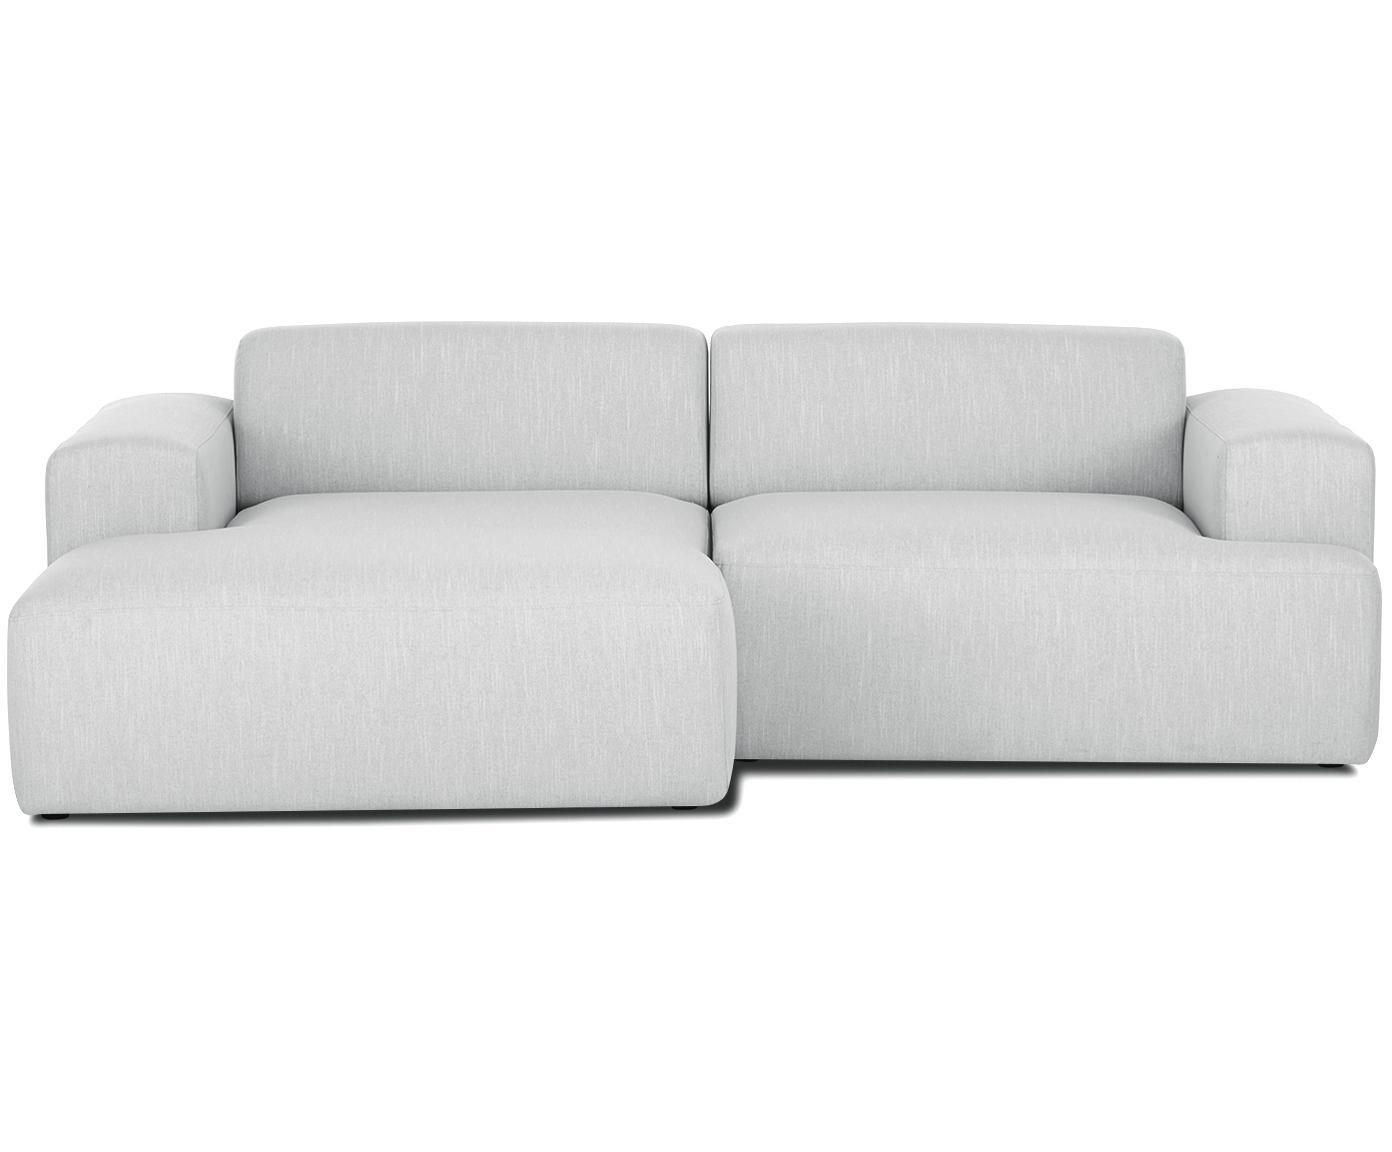 Ecksofa Melva (3-Sitzer), Bezug: Polyester 35.000 Scheuert, Gestell: Massives Kiefernholz, Spa, Webstoff Hellgrau, B 240 x T 144 cm